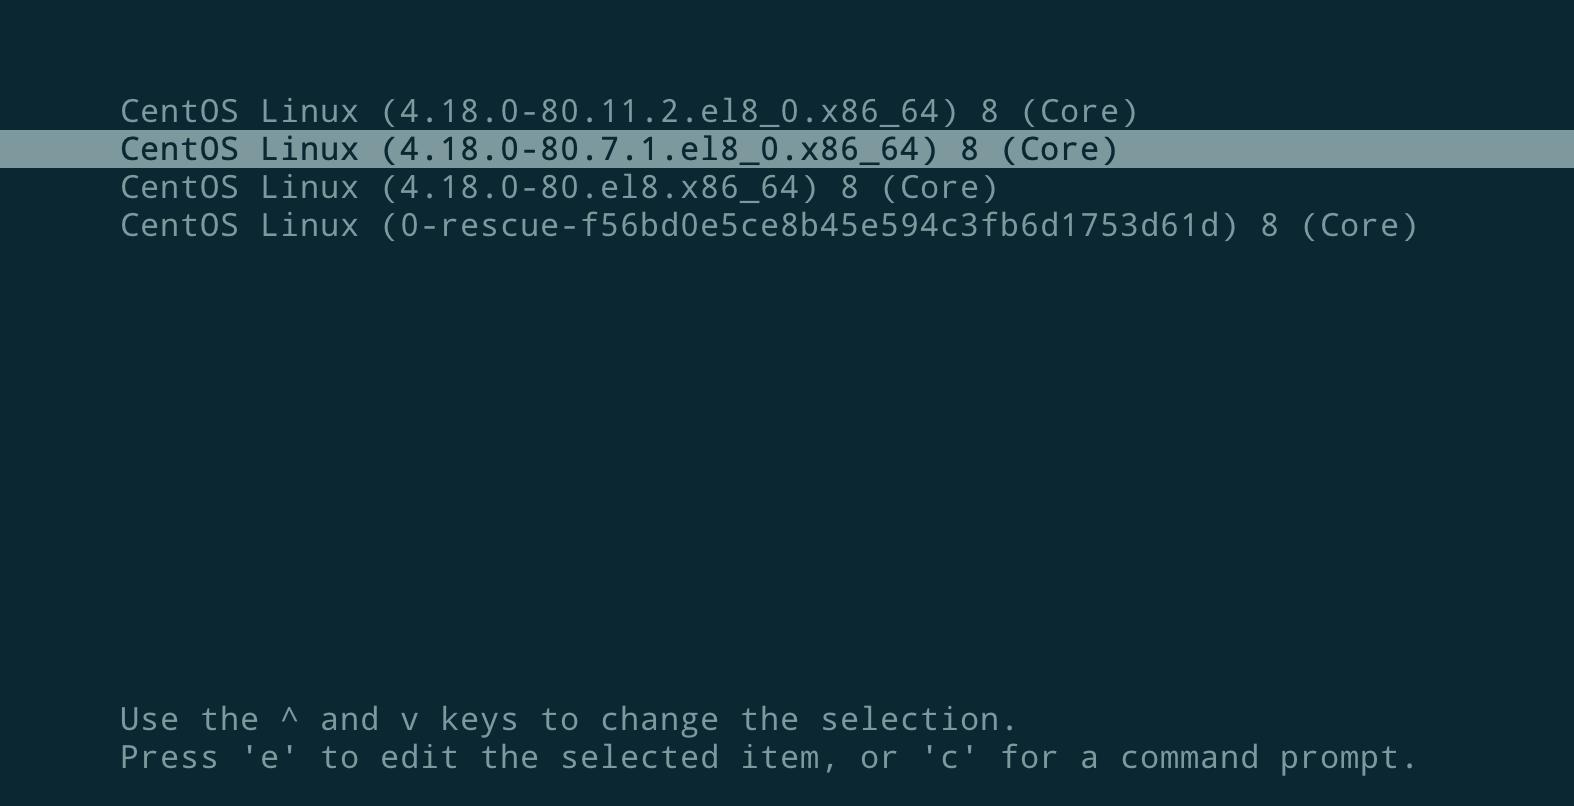 CentOS 8.x 和 RHEL 8.x 更改默认启动项